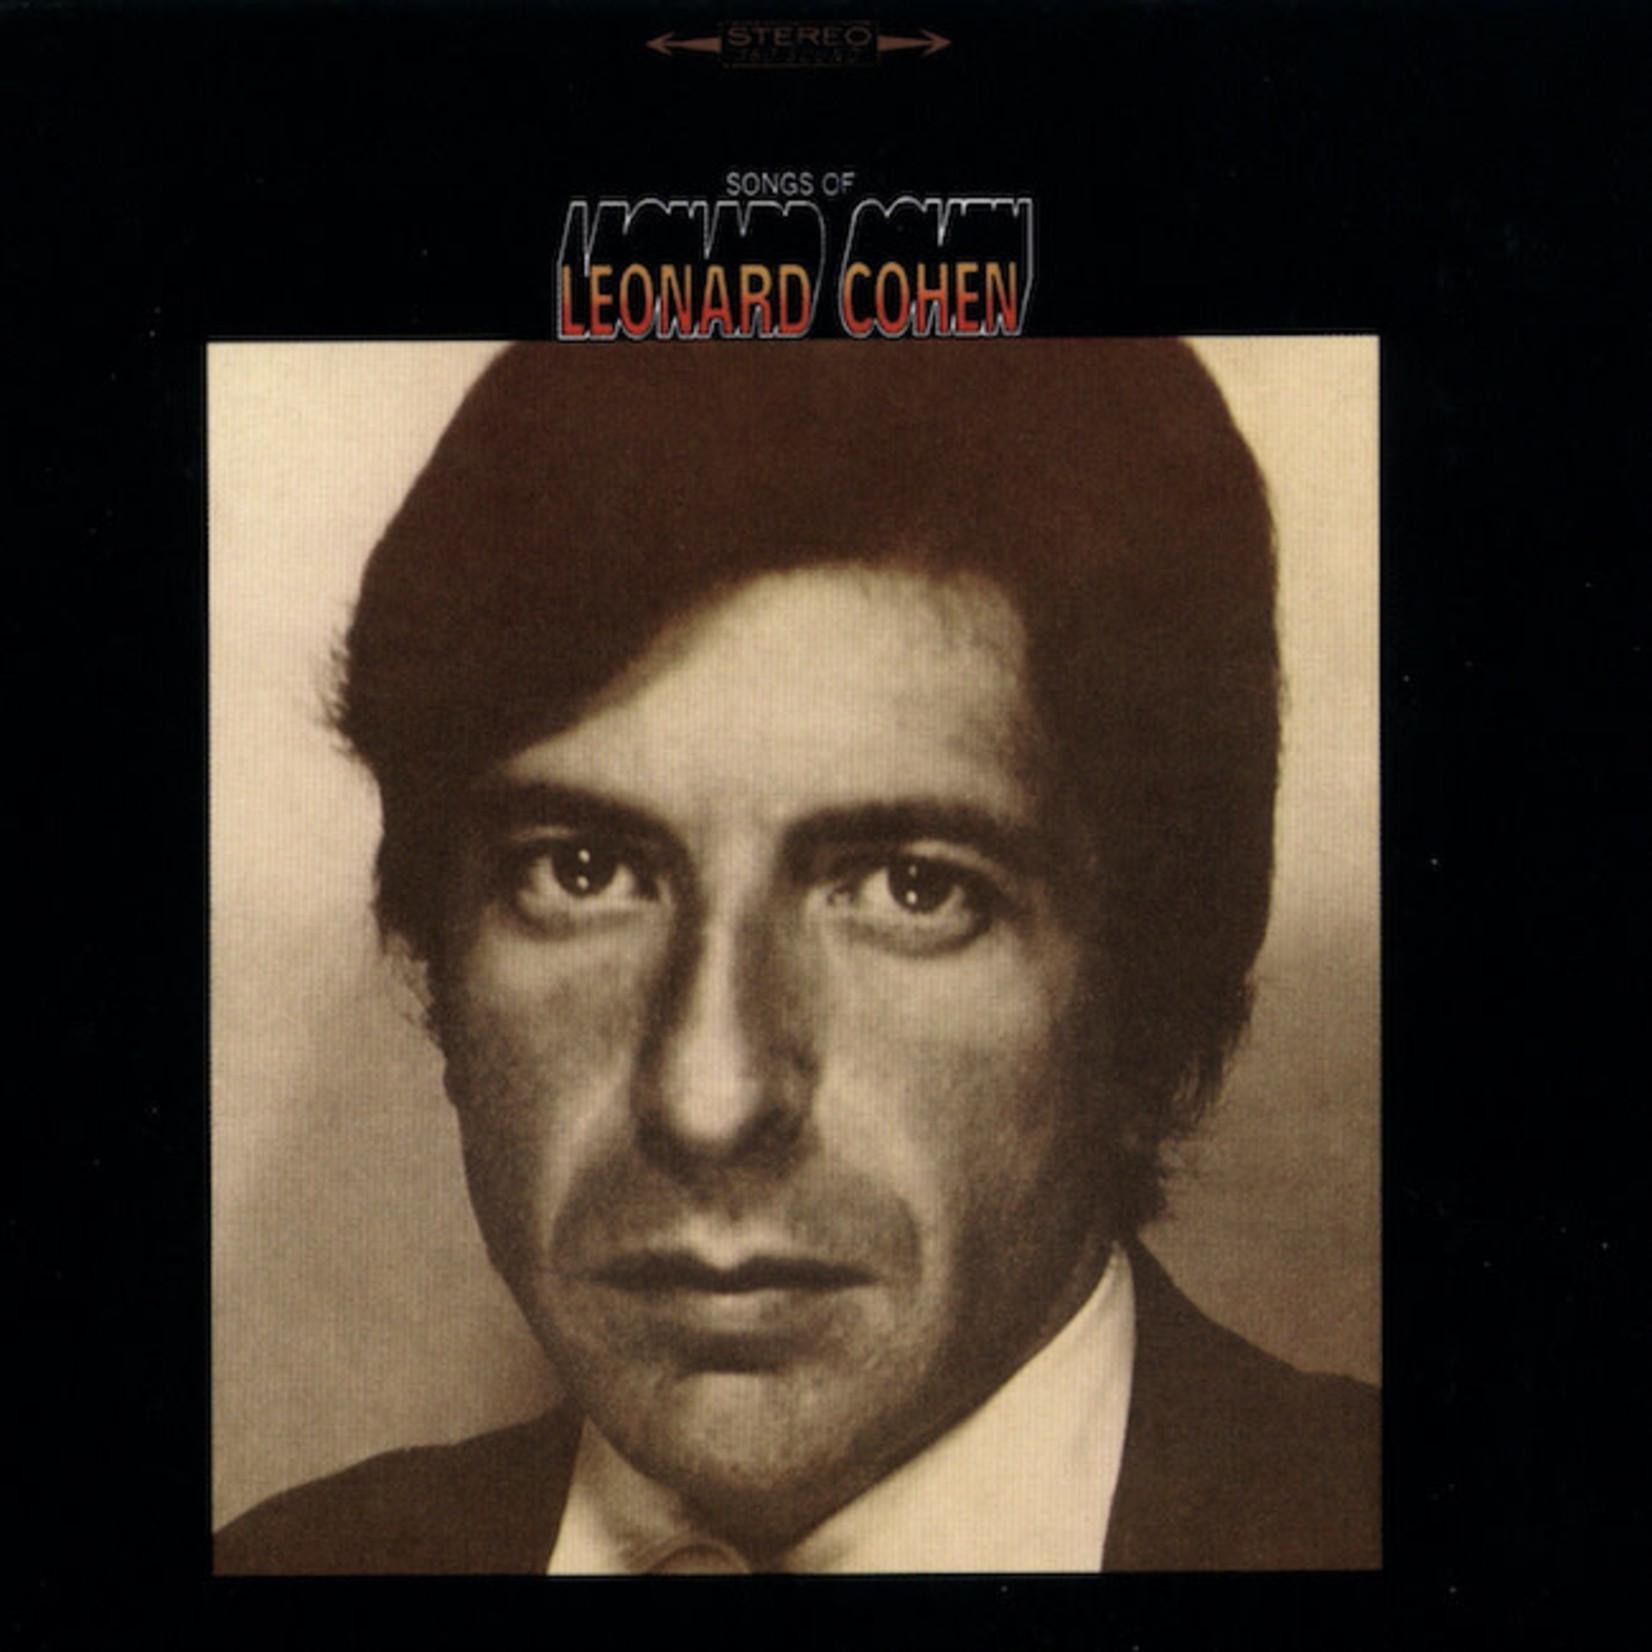 [Vintage] Cohen, Leonard: Songs of Leonard Cohen (orange/yellow reissue)